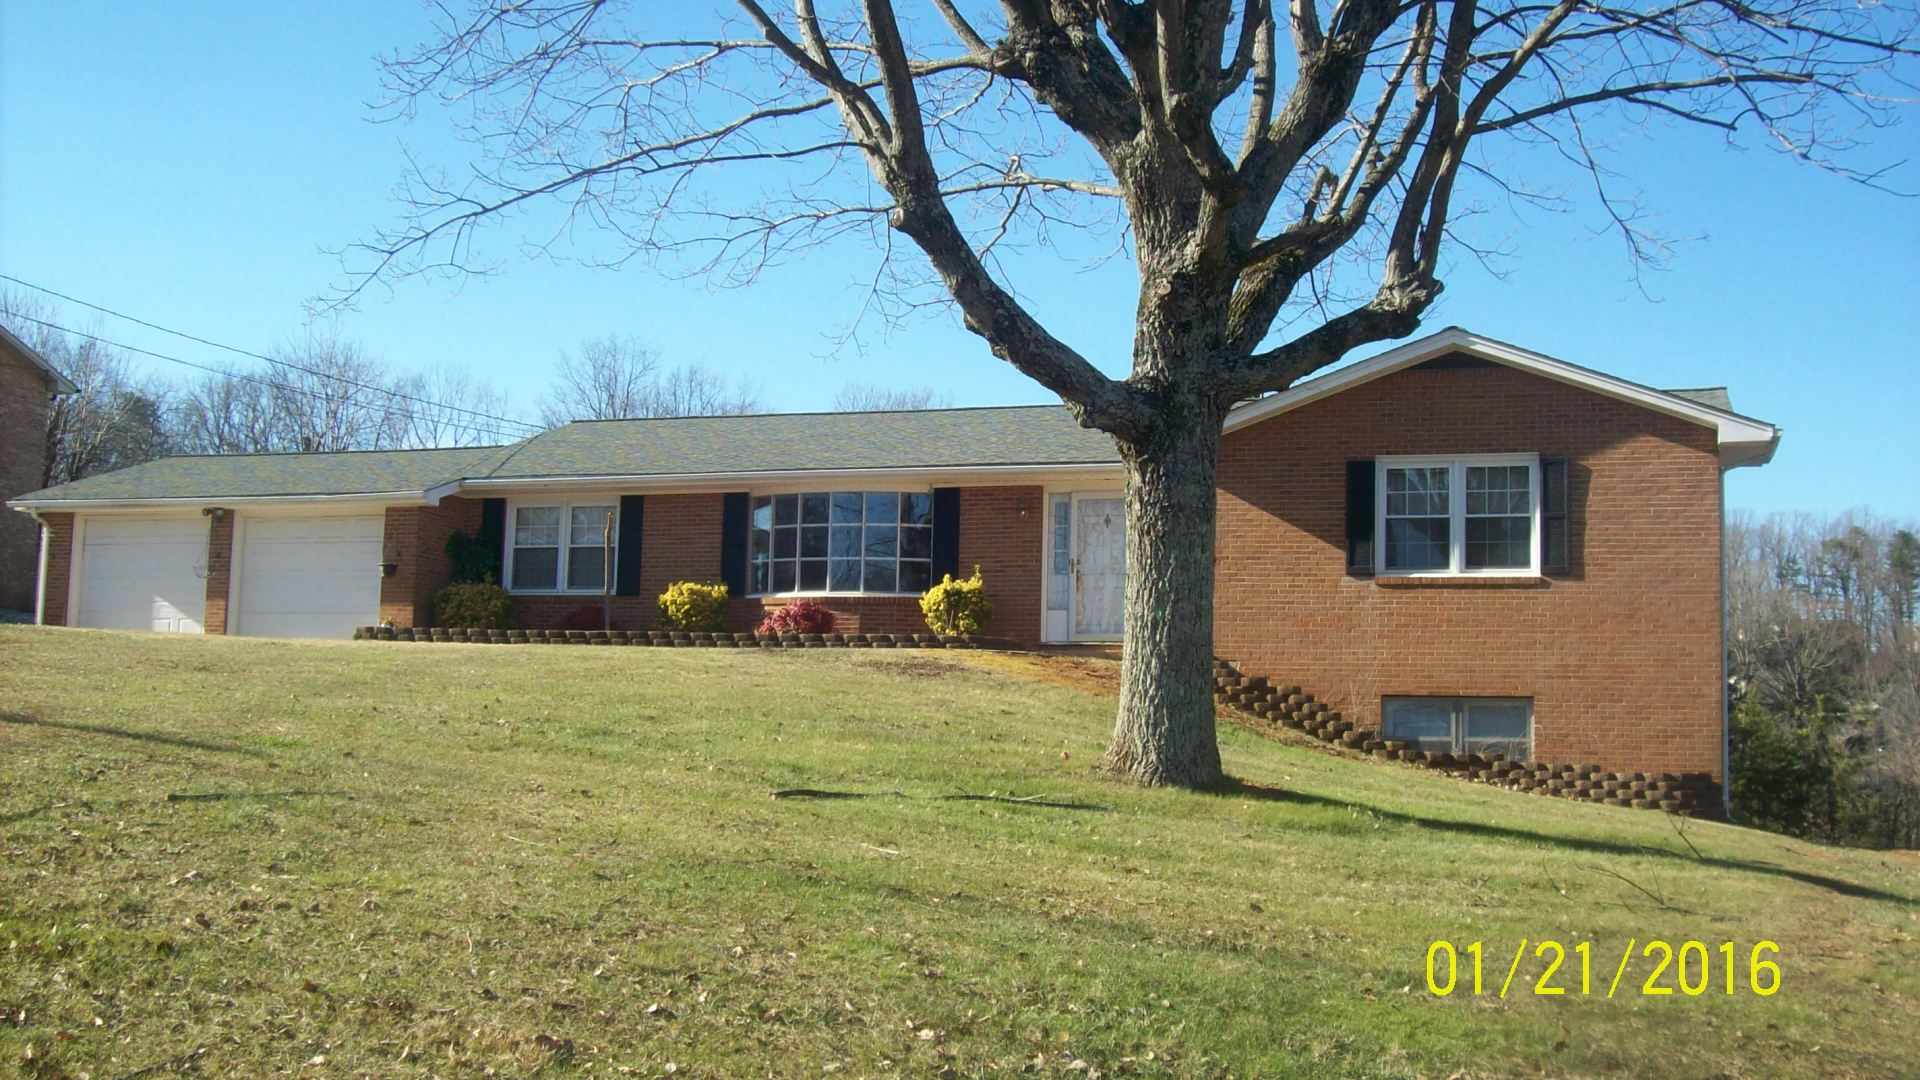 959 Colonial Dr, Collinsville, VA 24078